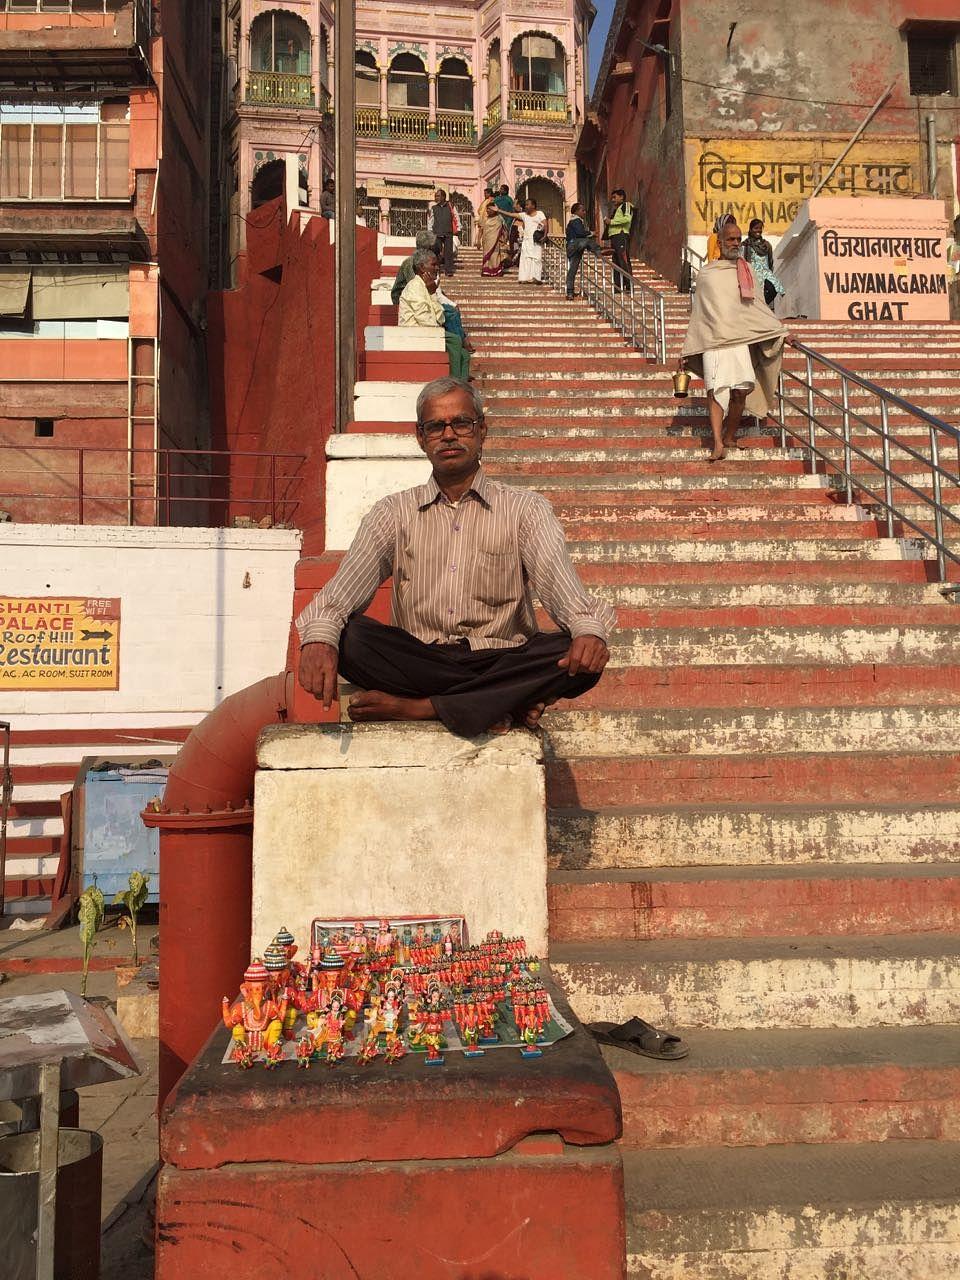 Rangnath Prajapati, painter of wooden figurines. (Photo: Jyoti Malhotra)